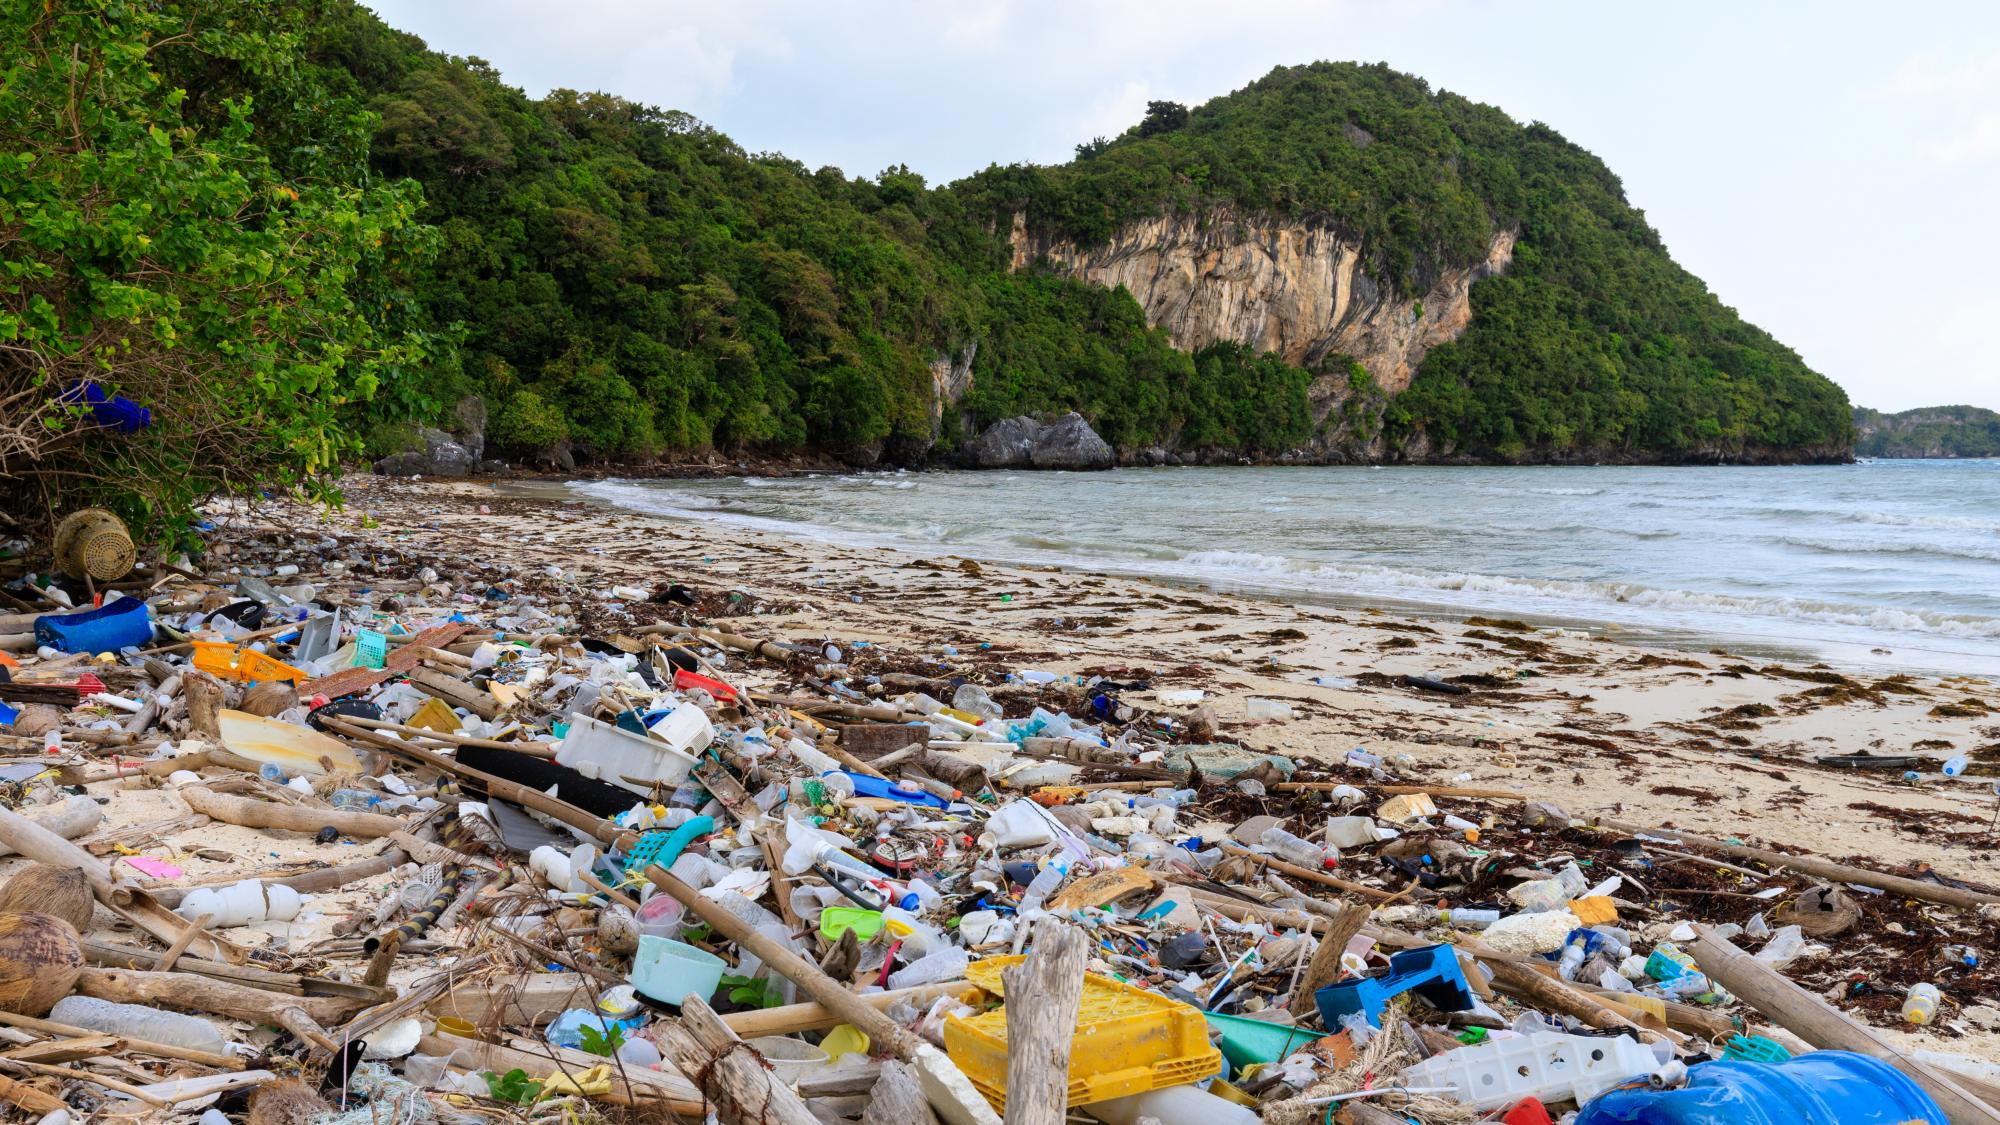 Ocean-bound plastic debri on a beach in southeast Asia